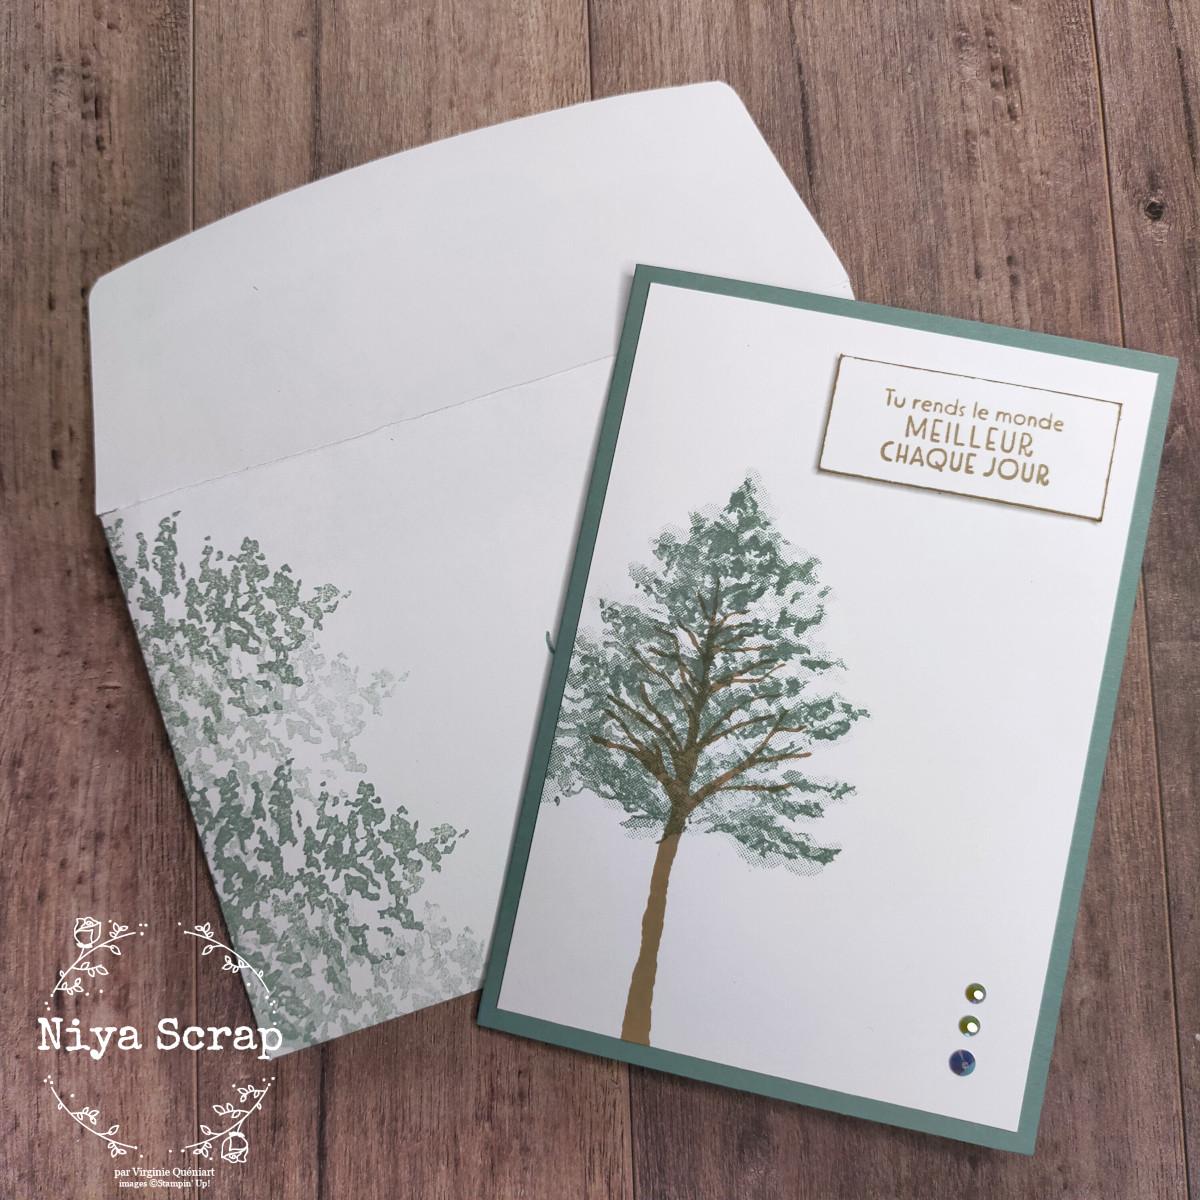 Niya Scrap - Swap de cartes - In Colors 2021-2023 - Soyeuse Succulente - Matériel Stampin' Up!